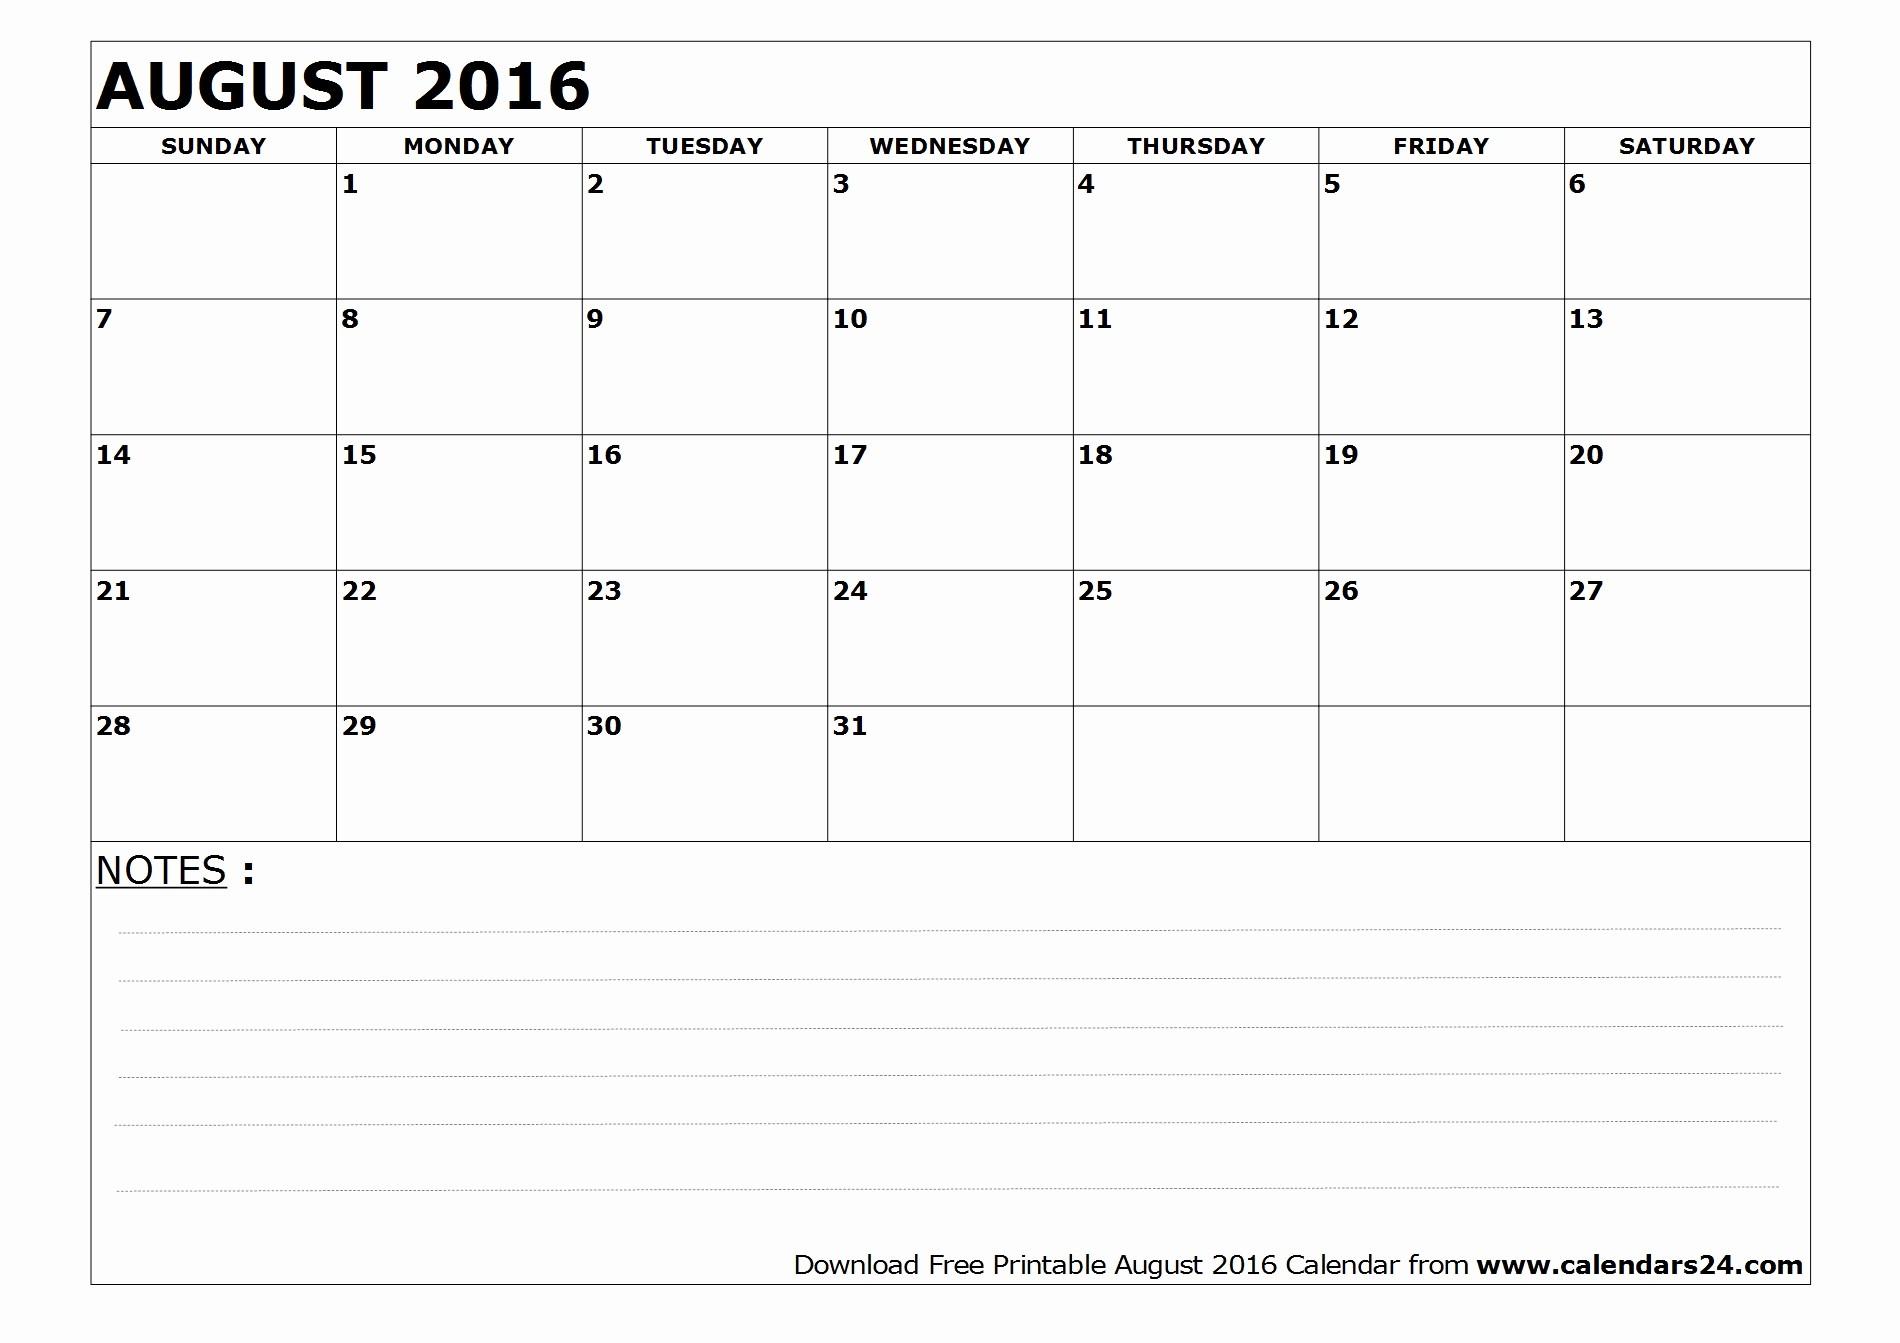 3 Month Calendar Printable 2016 Fresh August 2016 Calendar & September 2016 Calendar